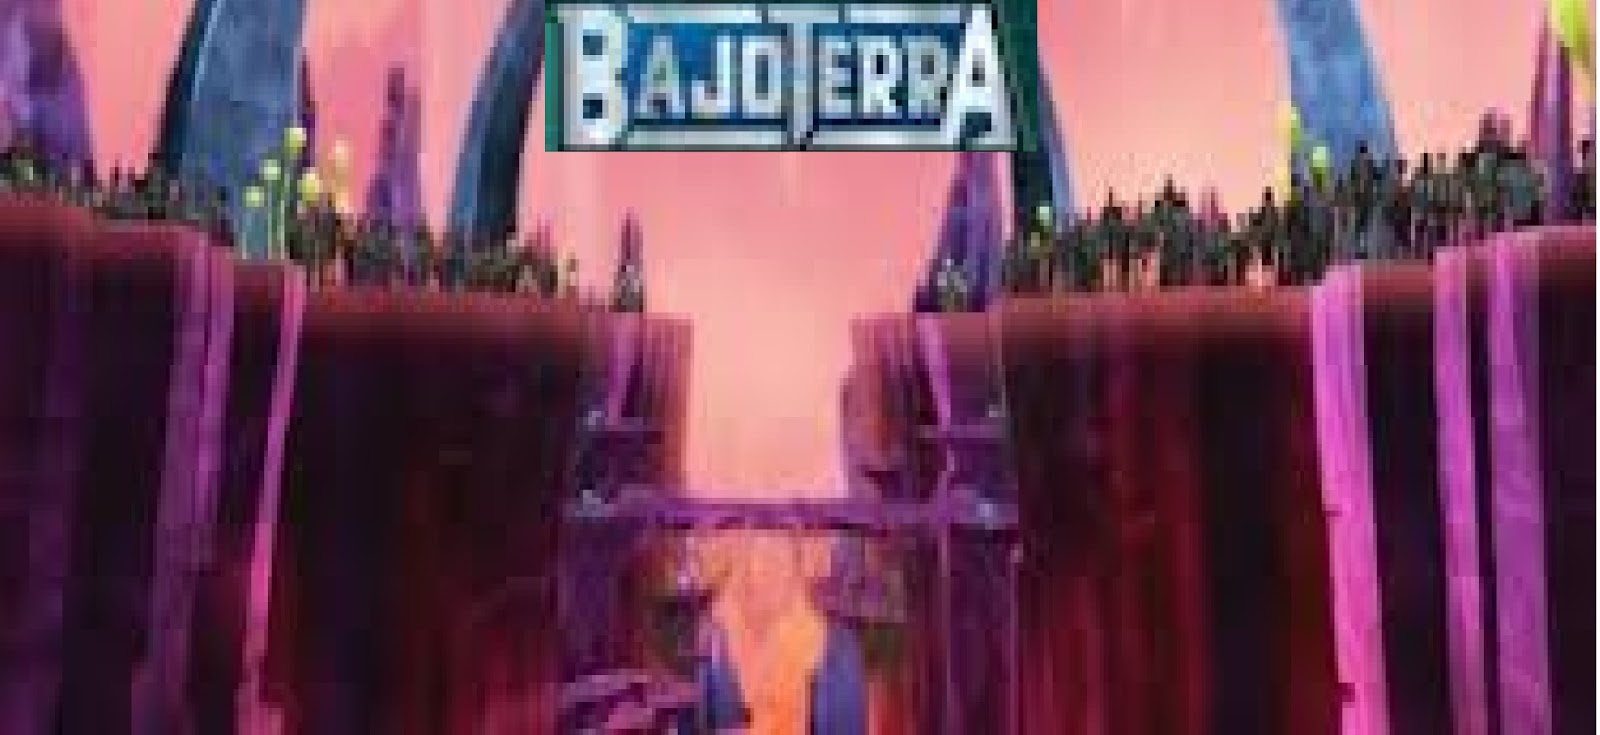 BAJOTERRA